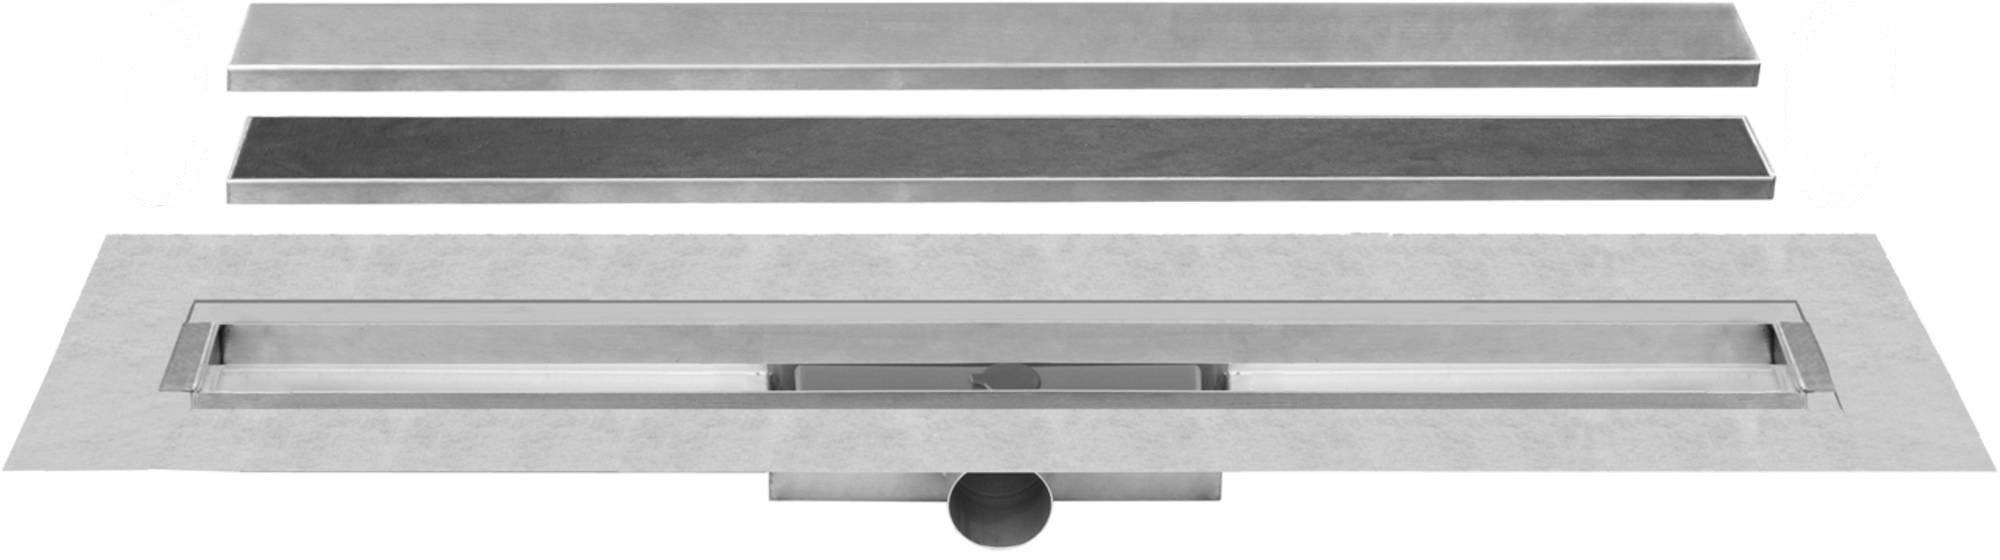 Easy Drain Compact 50 TAF afvoergoot 60 cm, rooster als zero of tegel design, rvs